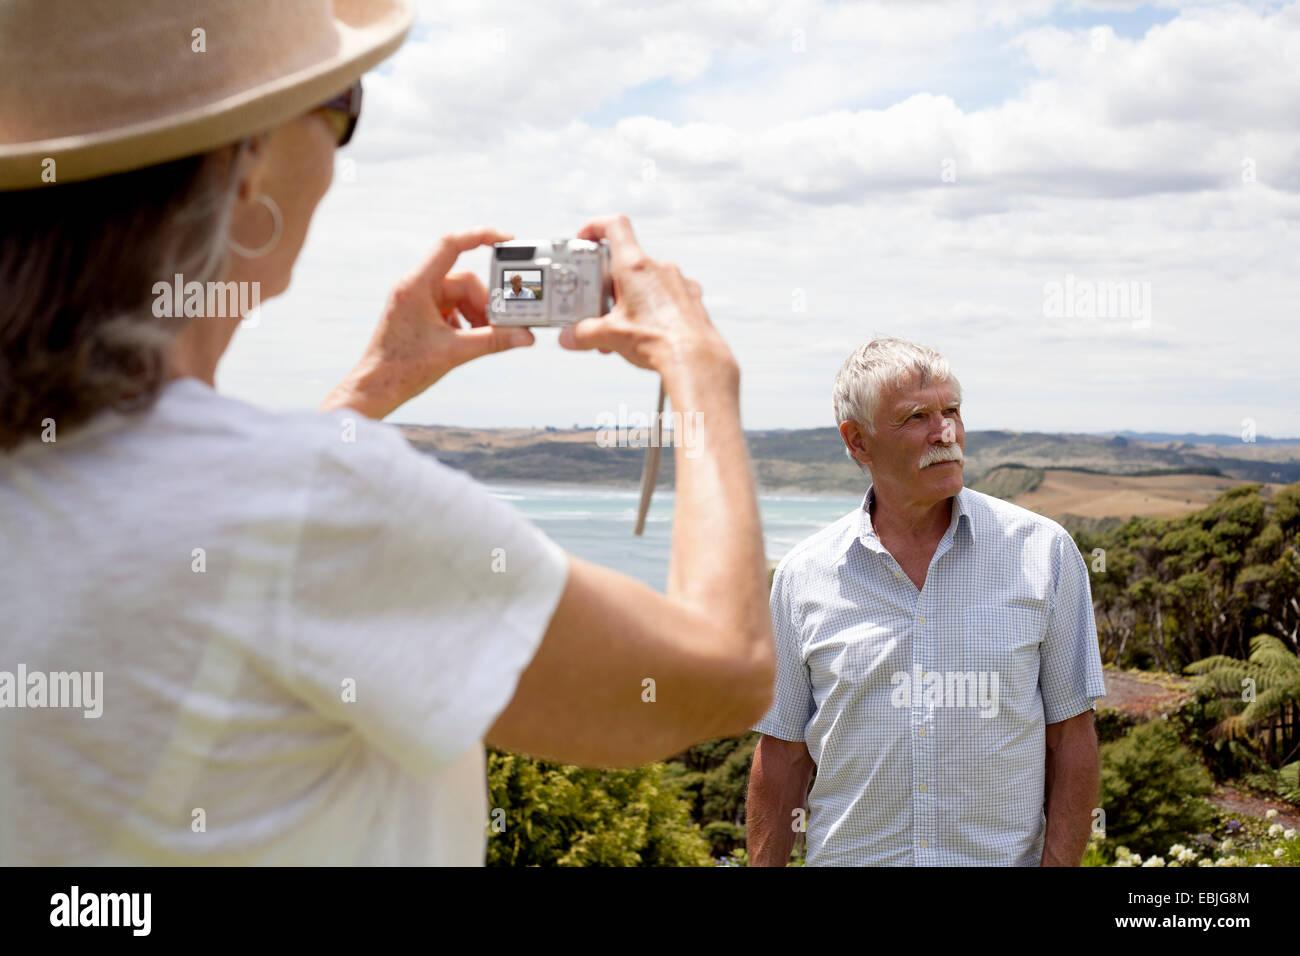 Frau fotografieren Mann, Ozean im Hintergrund, Raglan, Neuseeland Stockbild